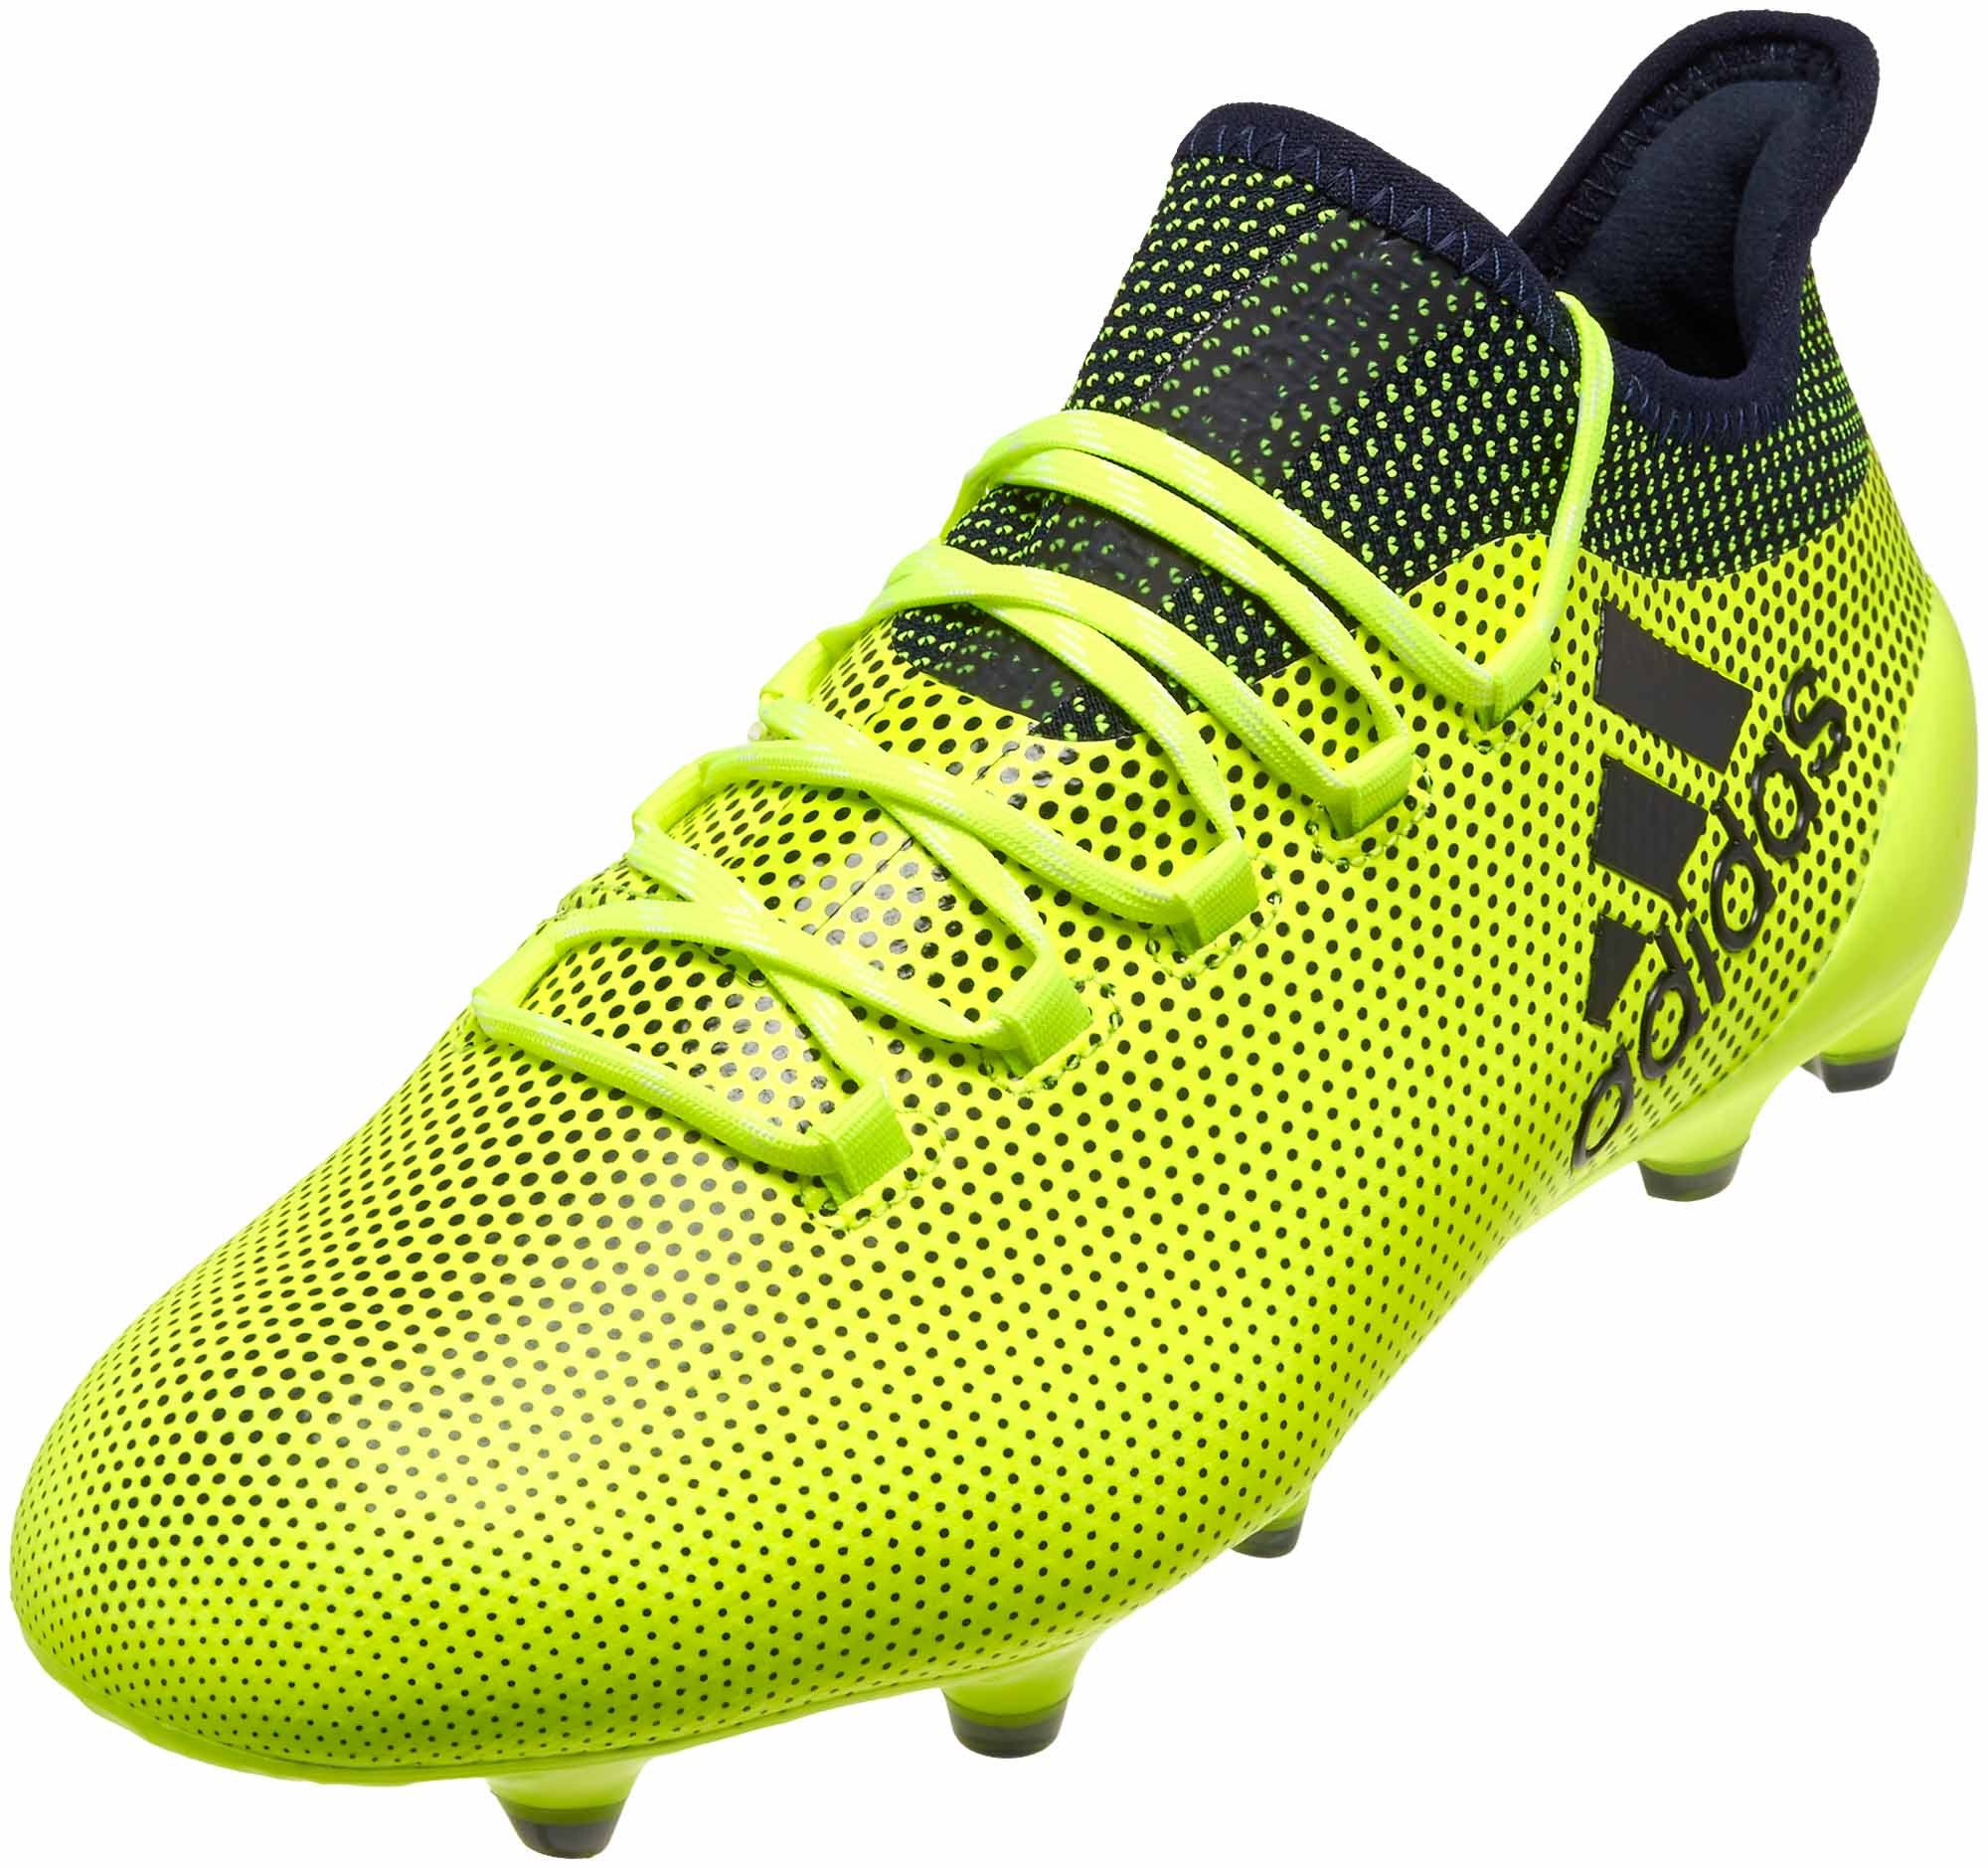 best service 6de04 349aa adidas X 17.1 FG - Solar Yellow & Legend Ink